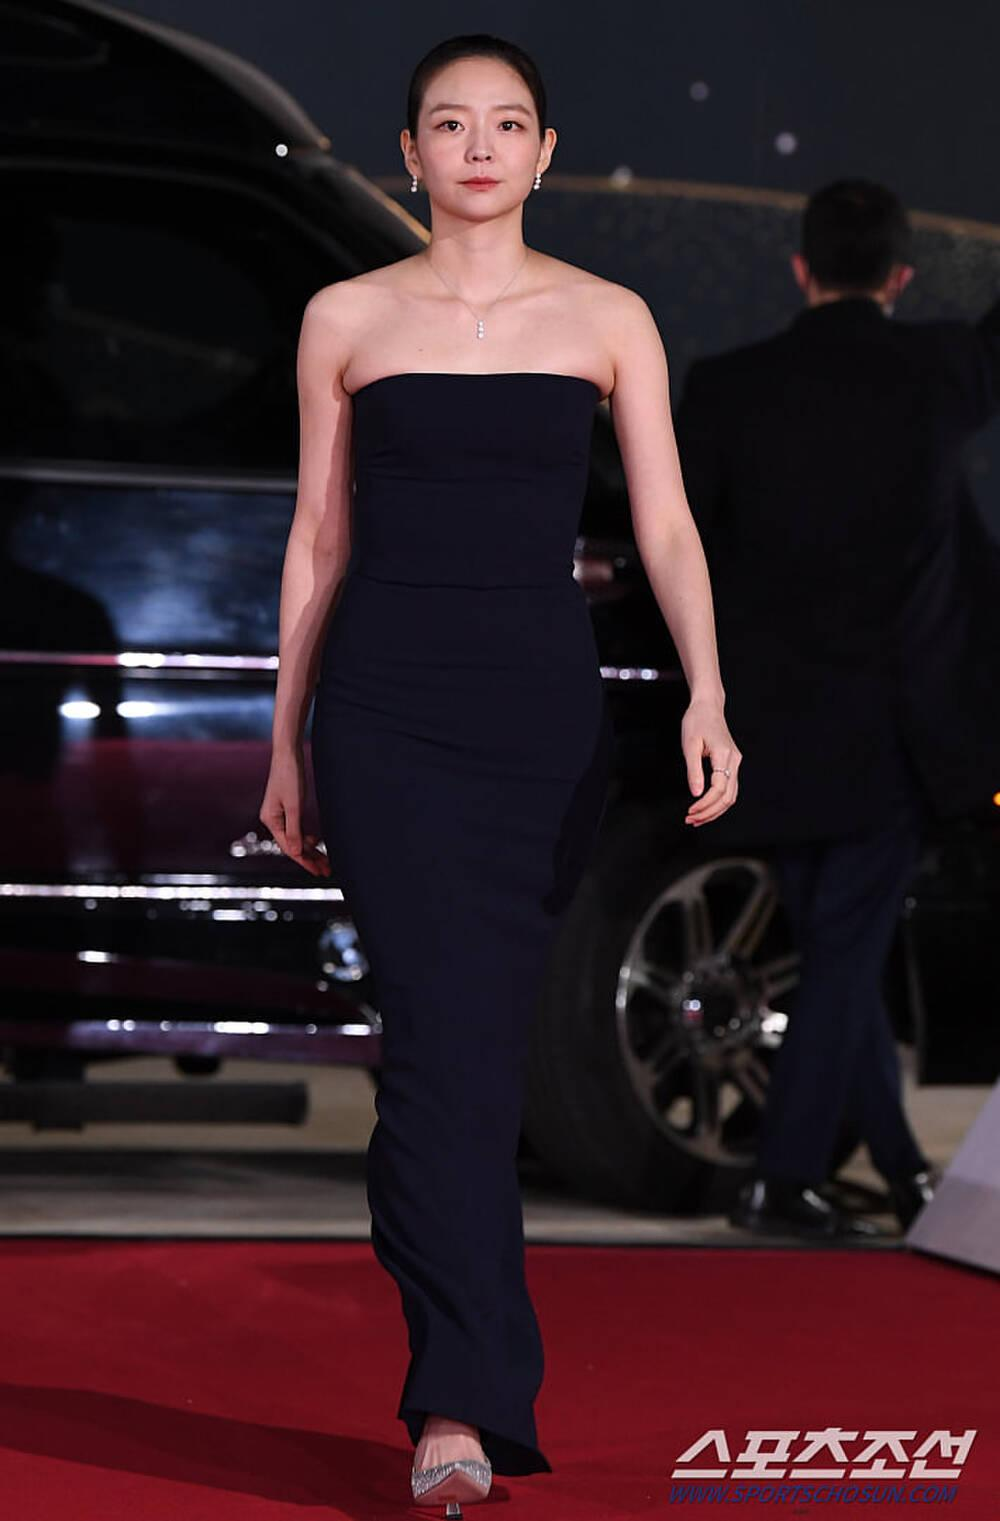 Thảm đỏ 'Rồng xanh 2020': Shin Hye Sun 'cân sắc' Shin Min Ah, Jung Woo Sung - Lee Byung Hun điển trai! Ảnh 23